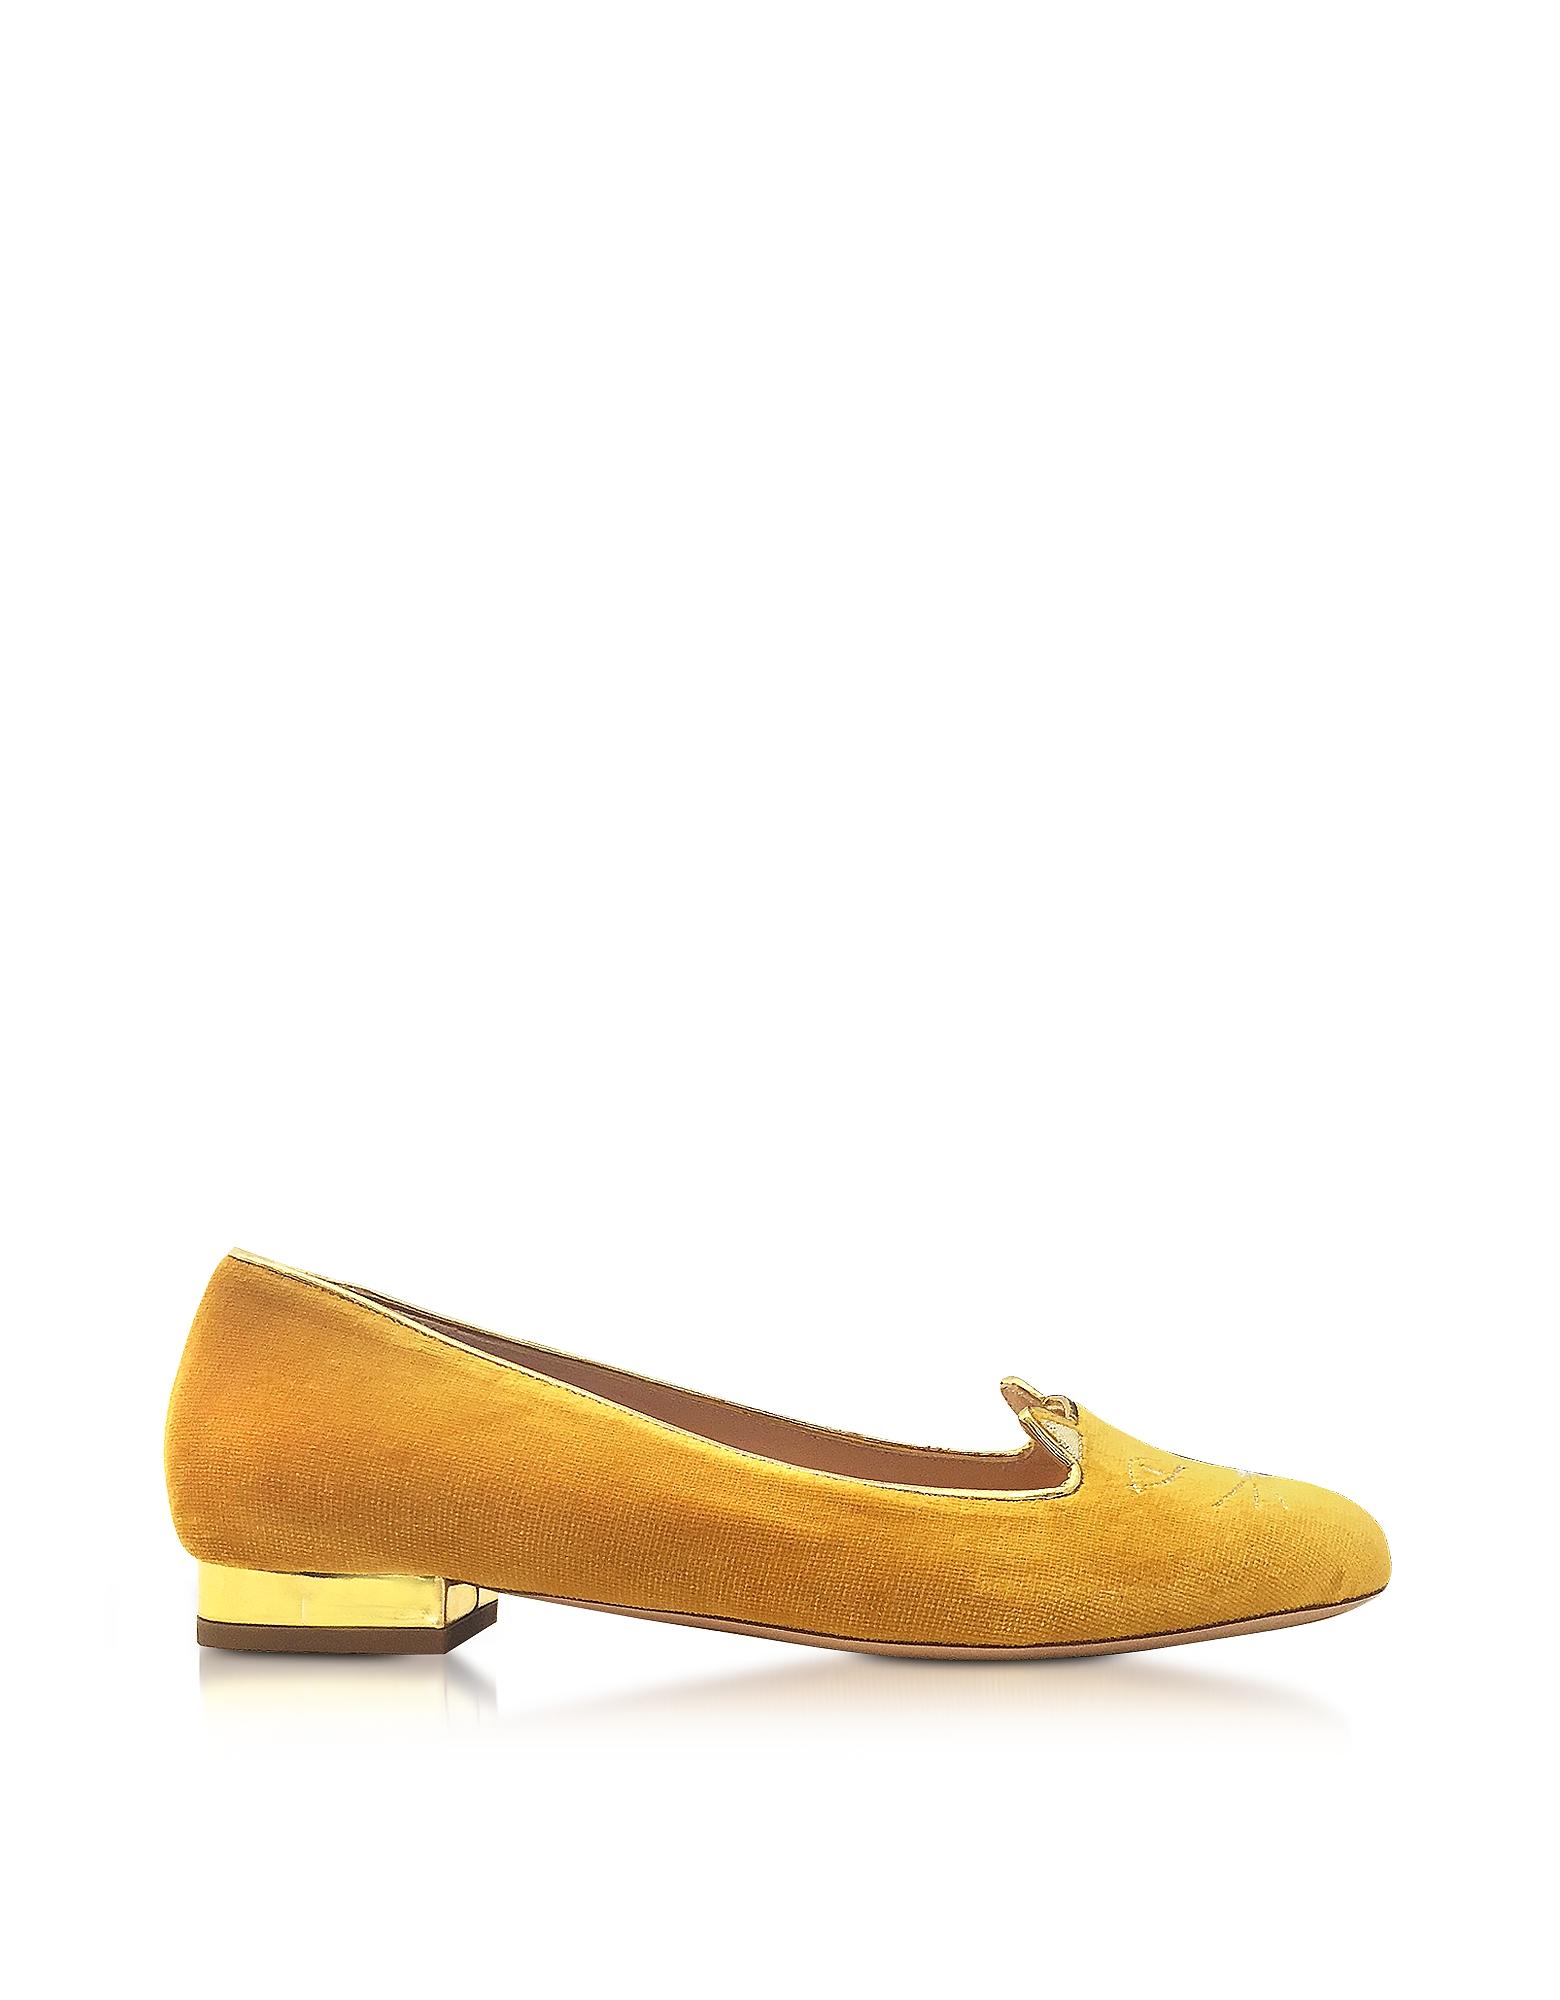 Kitty - Желтые Бархатные Туфли на Плоской Подошве